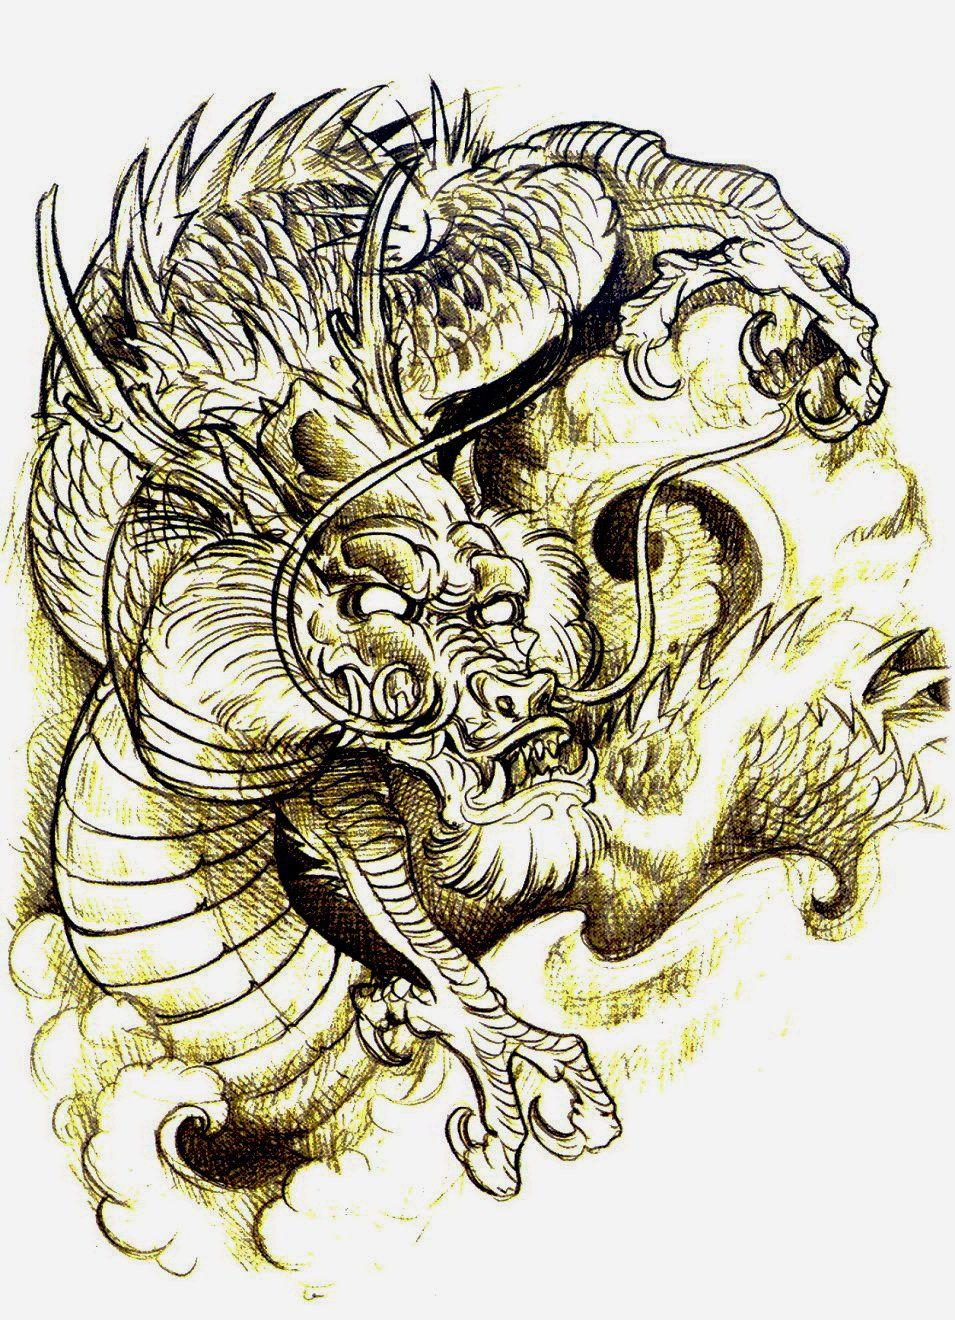 Cabezas De Dragones Para Tatuar jee sayalero tattoo sketchbook (53) (955×1320) | tatuaje